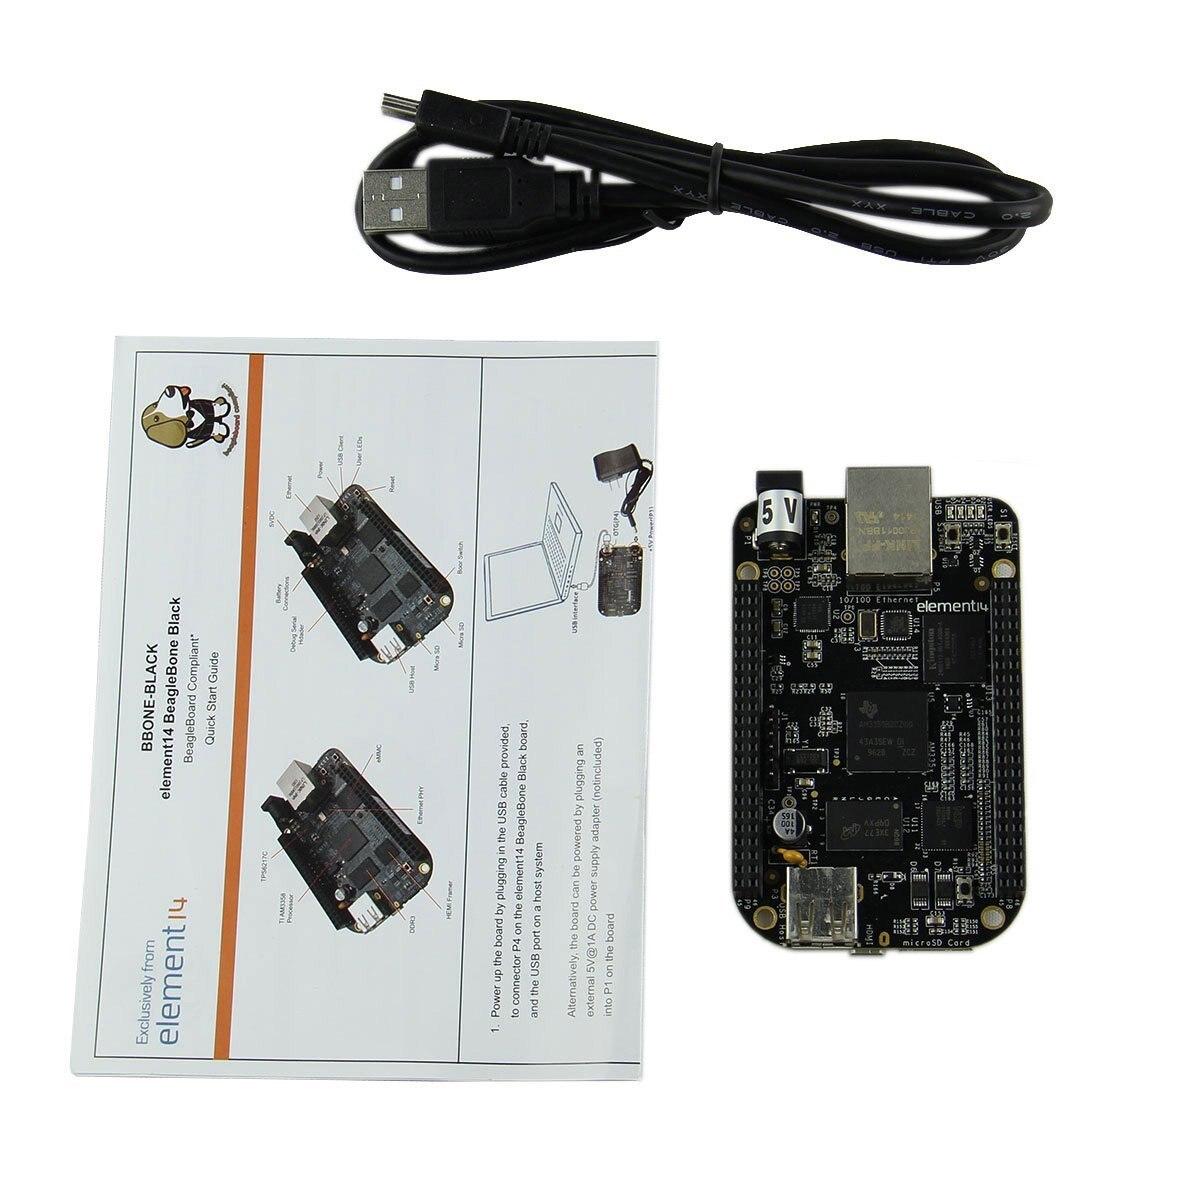 Embest BeagleBone BB Black 1GHz TI AM3358x Cortex-A8 Development Board REV C VersionEmbest BeagleBone BB Black 1GHz TI AM3358x Cortex-A8 Development Board REV C Version